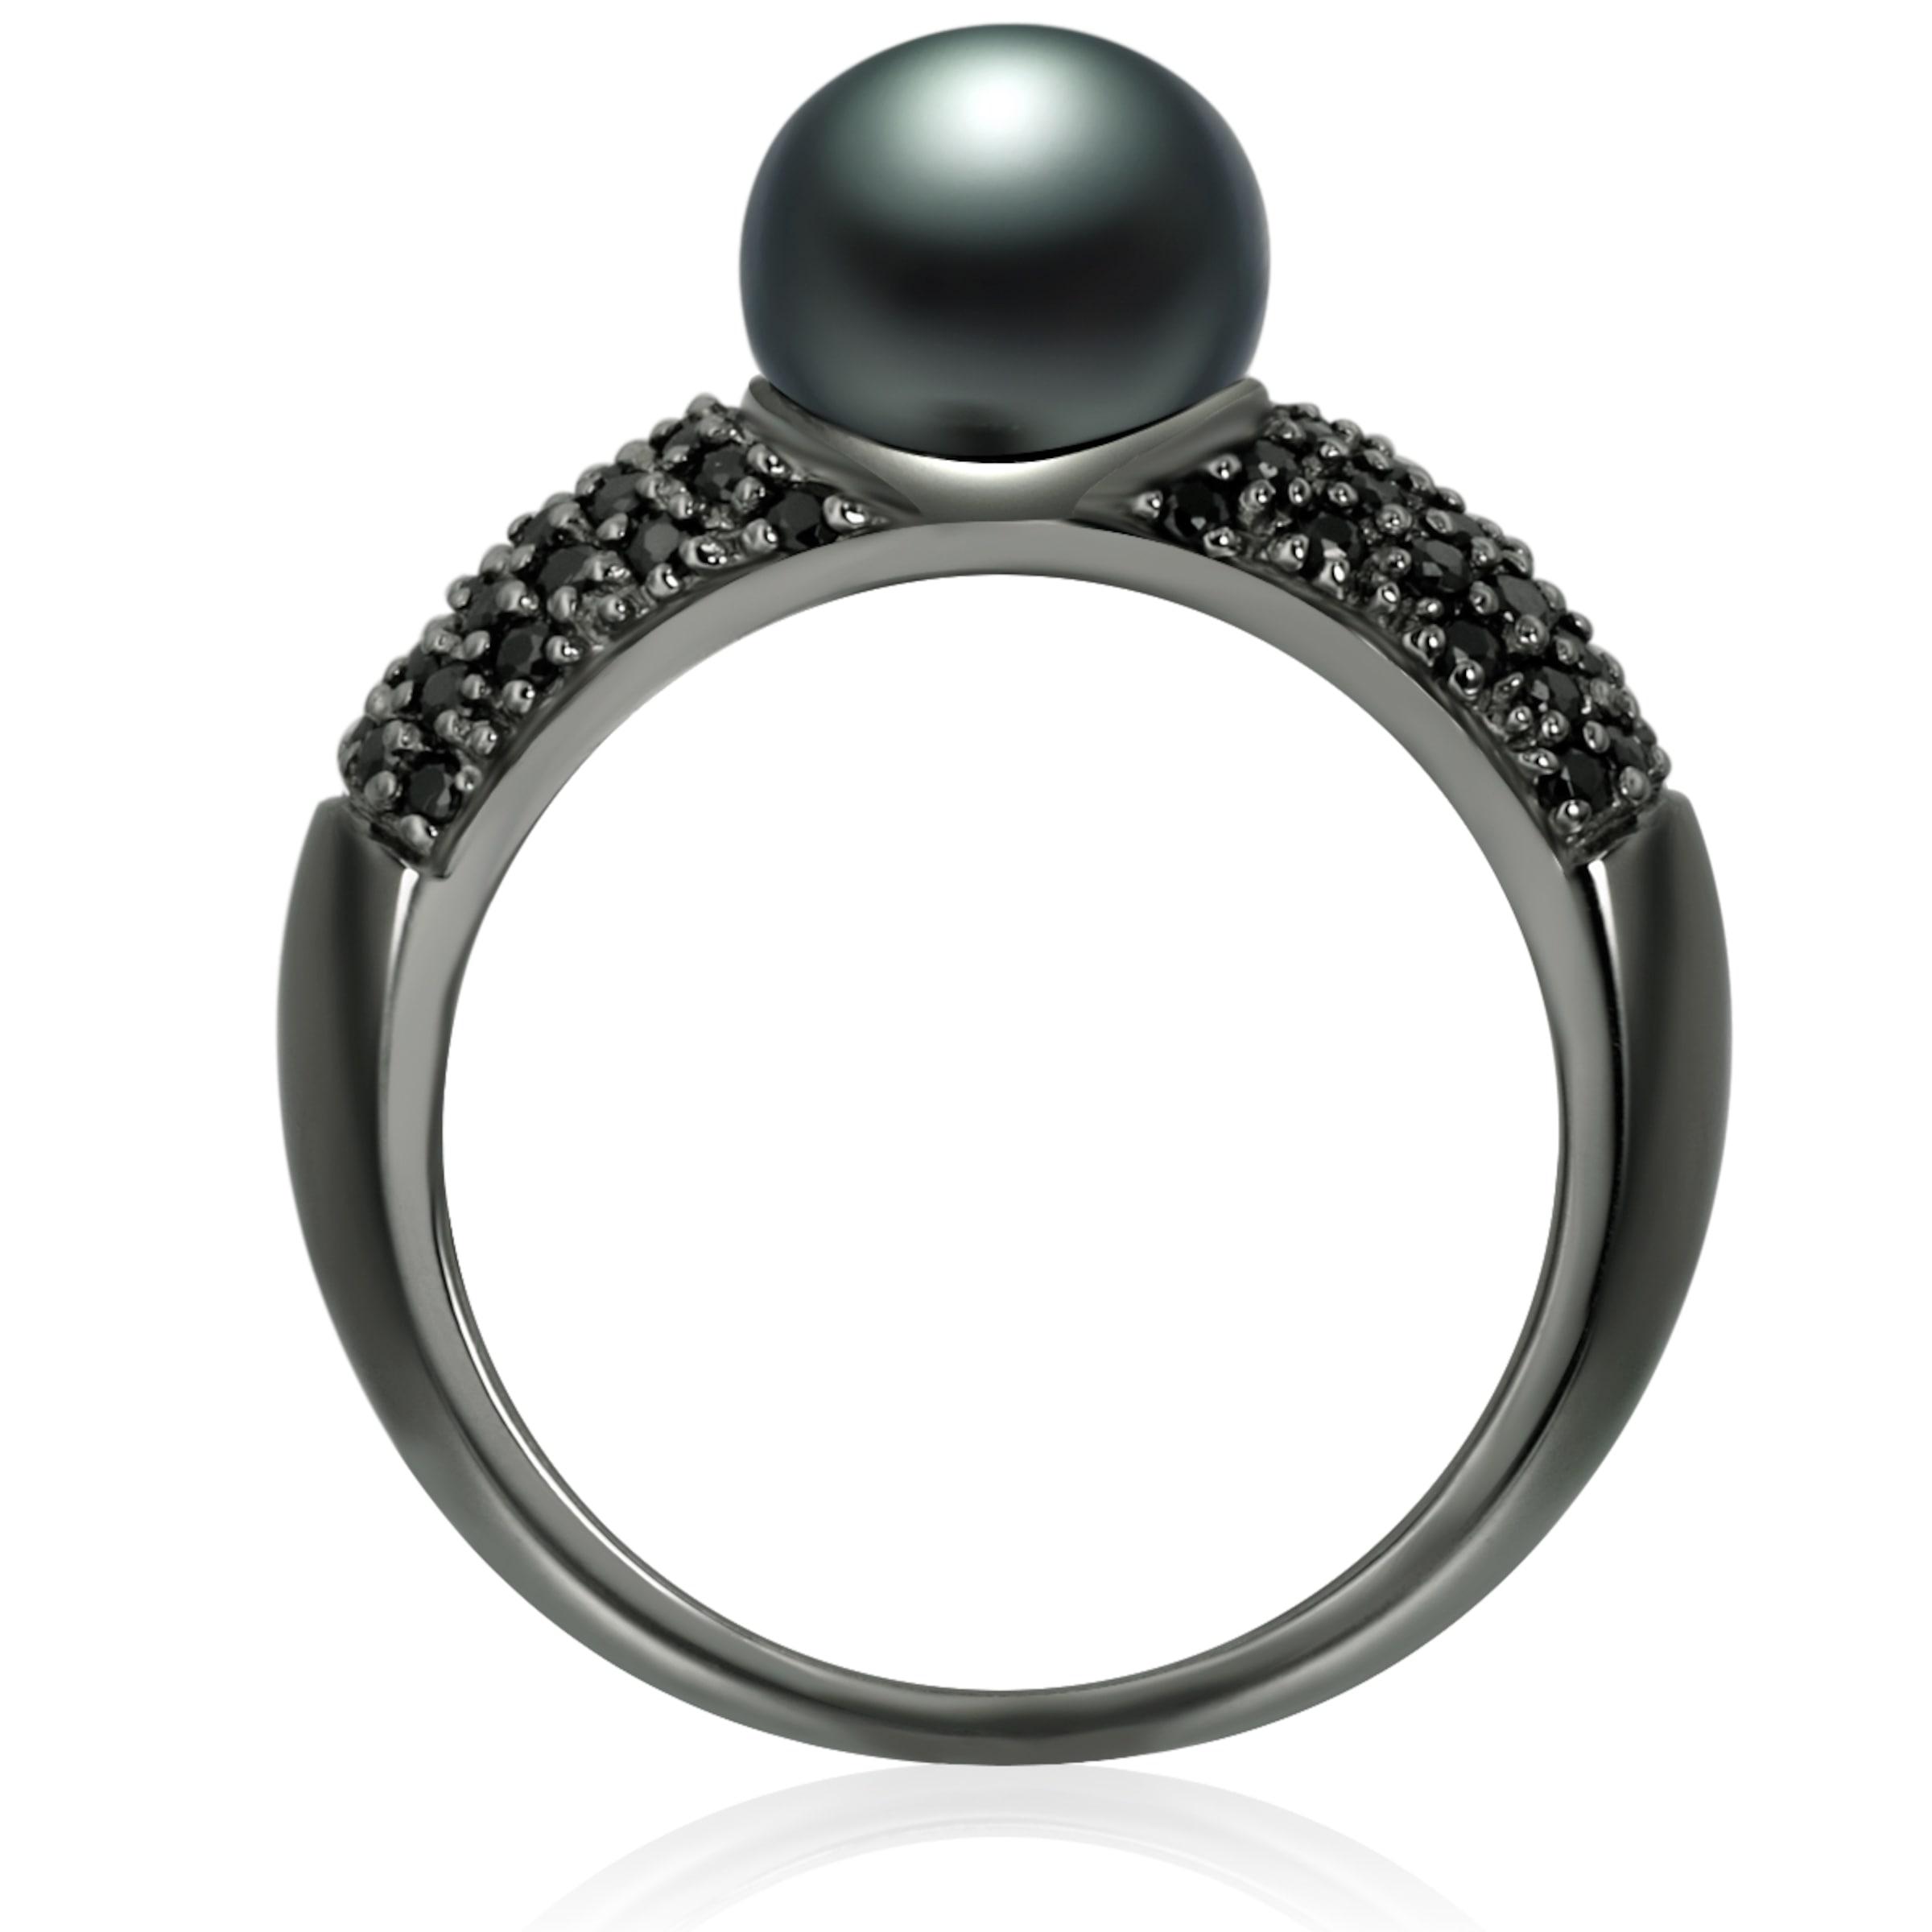 Auslass Besuch Neu Valero Pearls Ring Eastbay Verkauf Online QZNZJZr6Yr